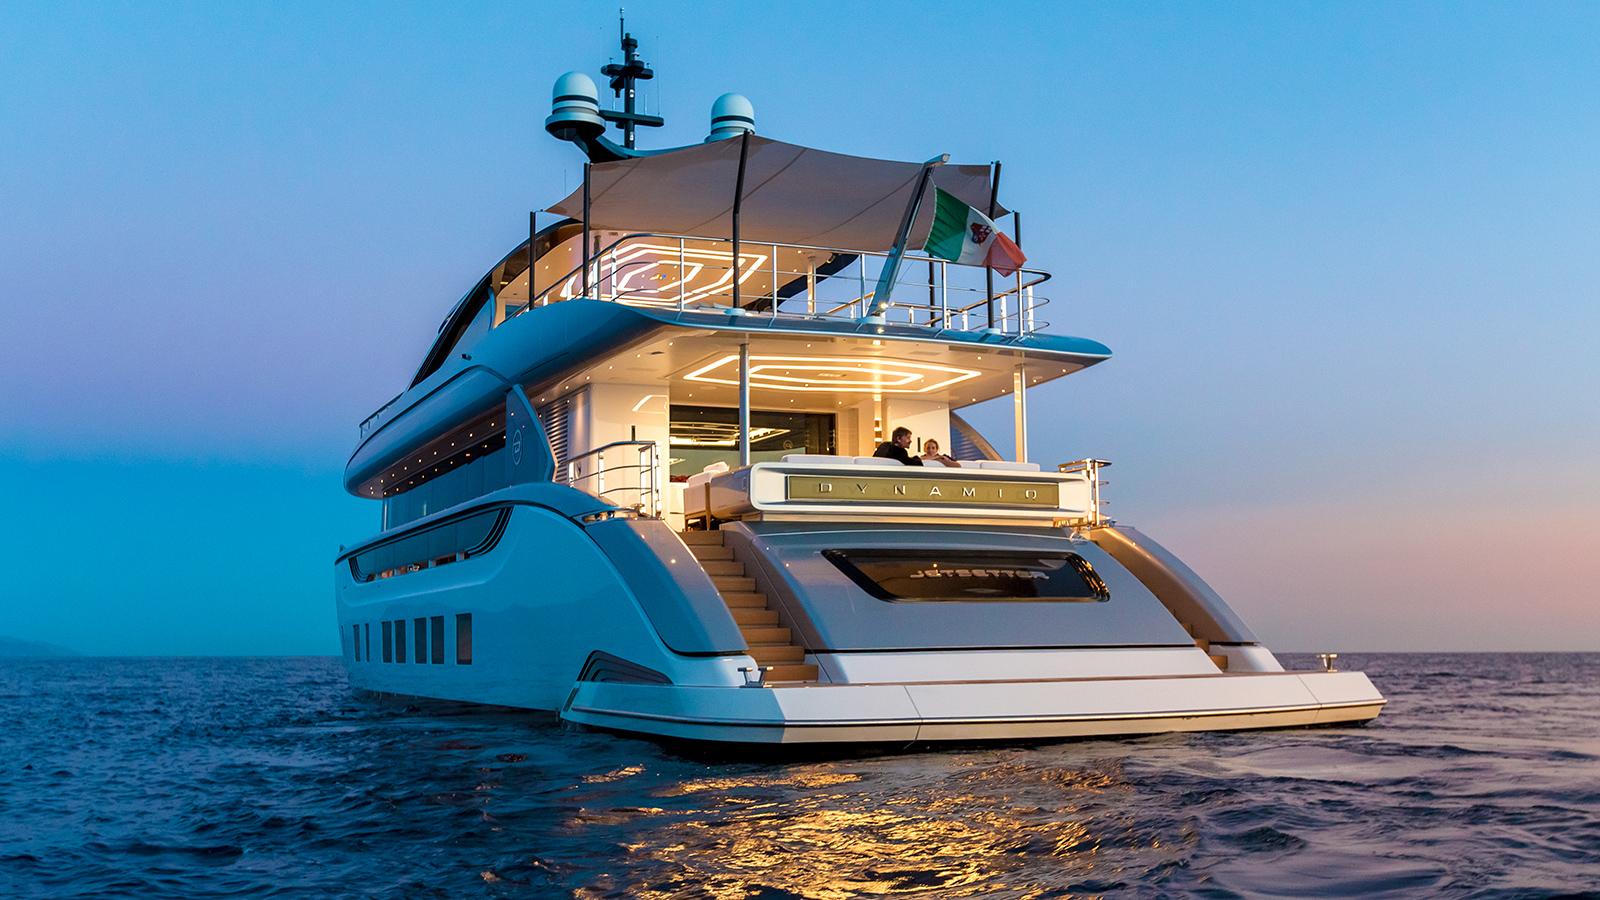 the-transom-of-dynamiq-super-yacht-jetsetter